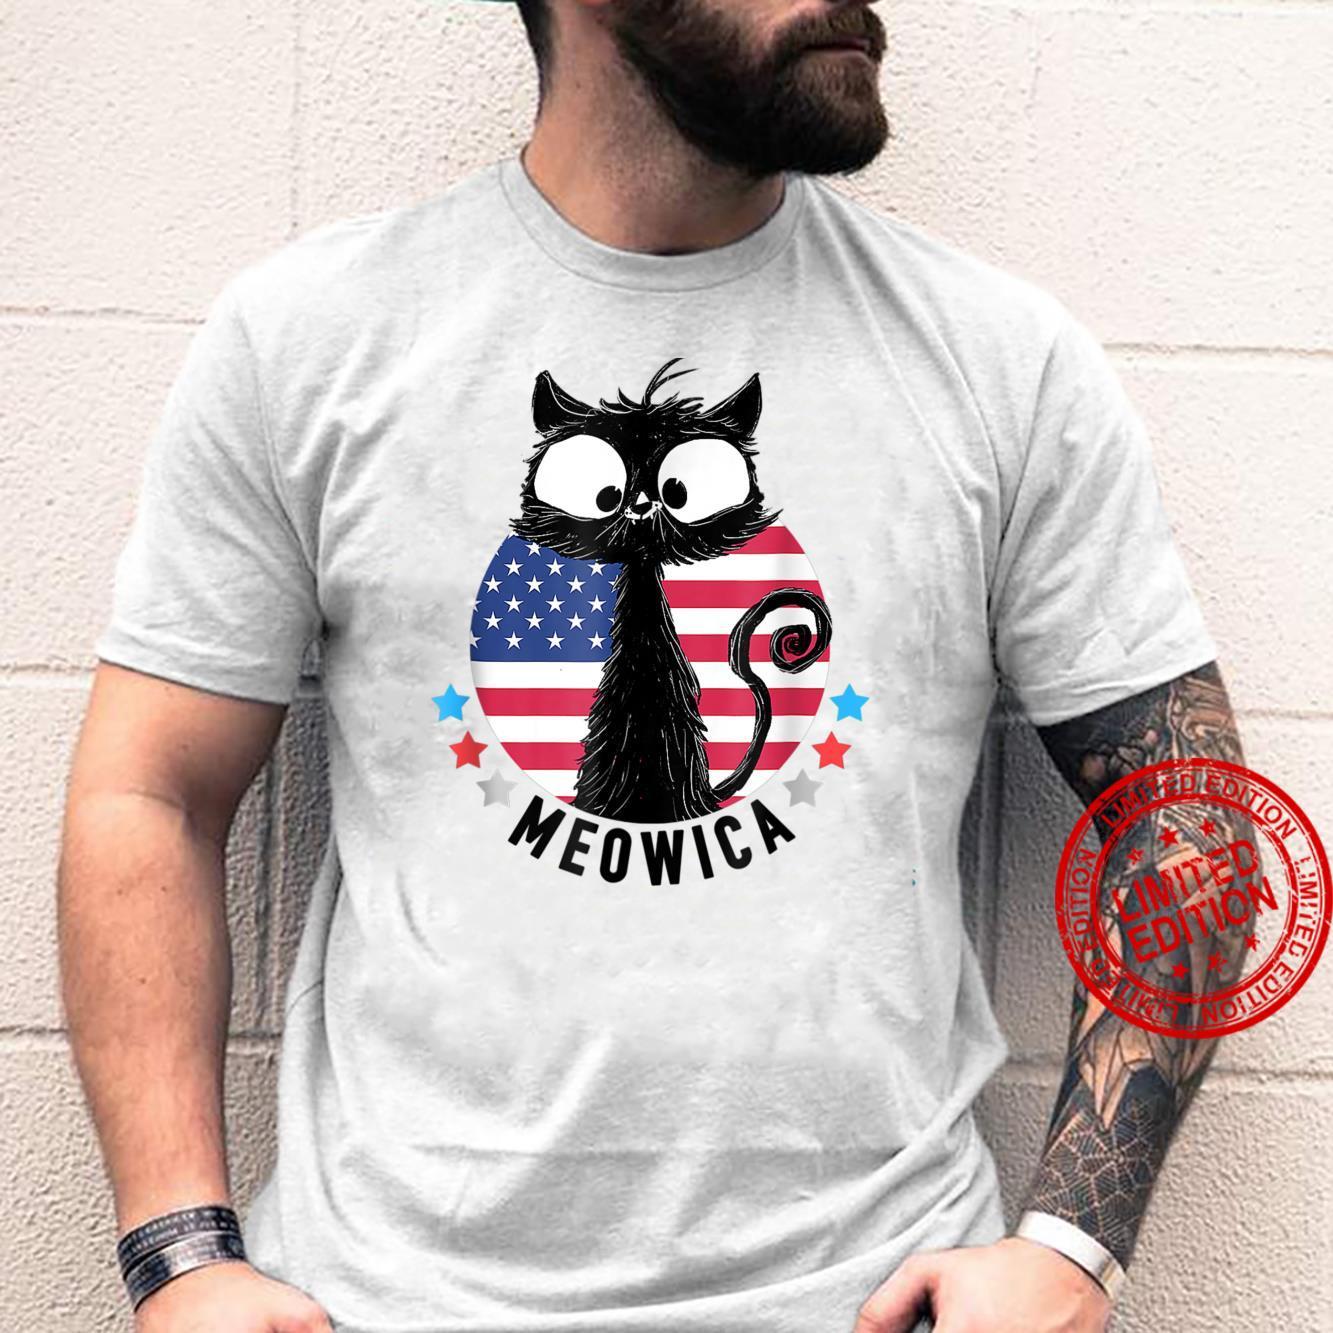 American Flag MEOWICA Cat Shirt 4th of July Cat Shirt